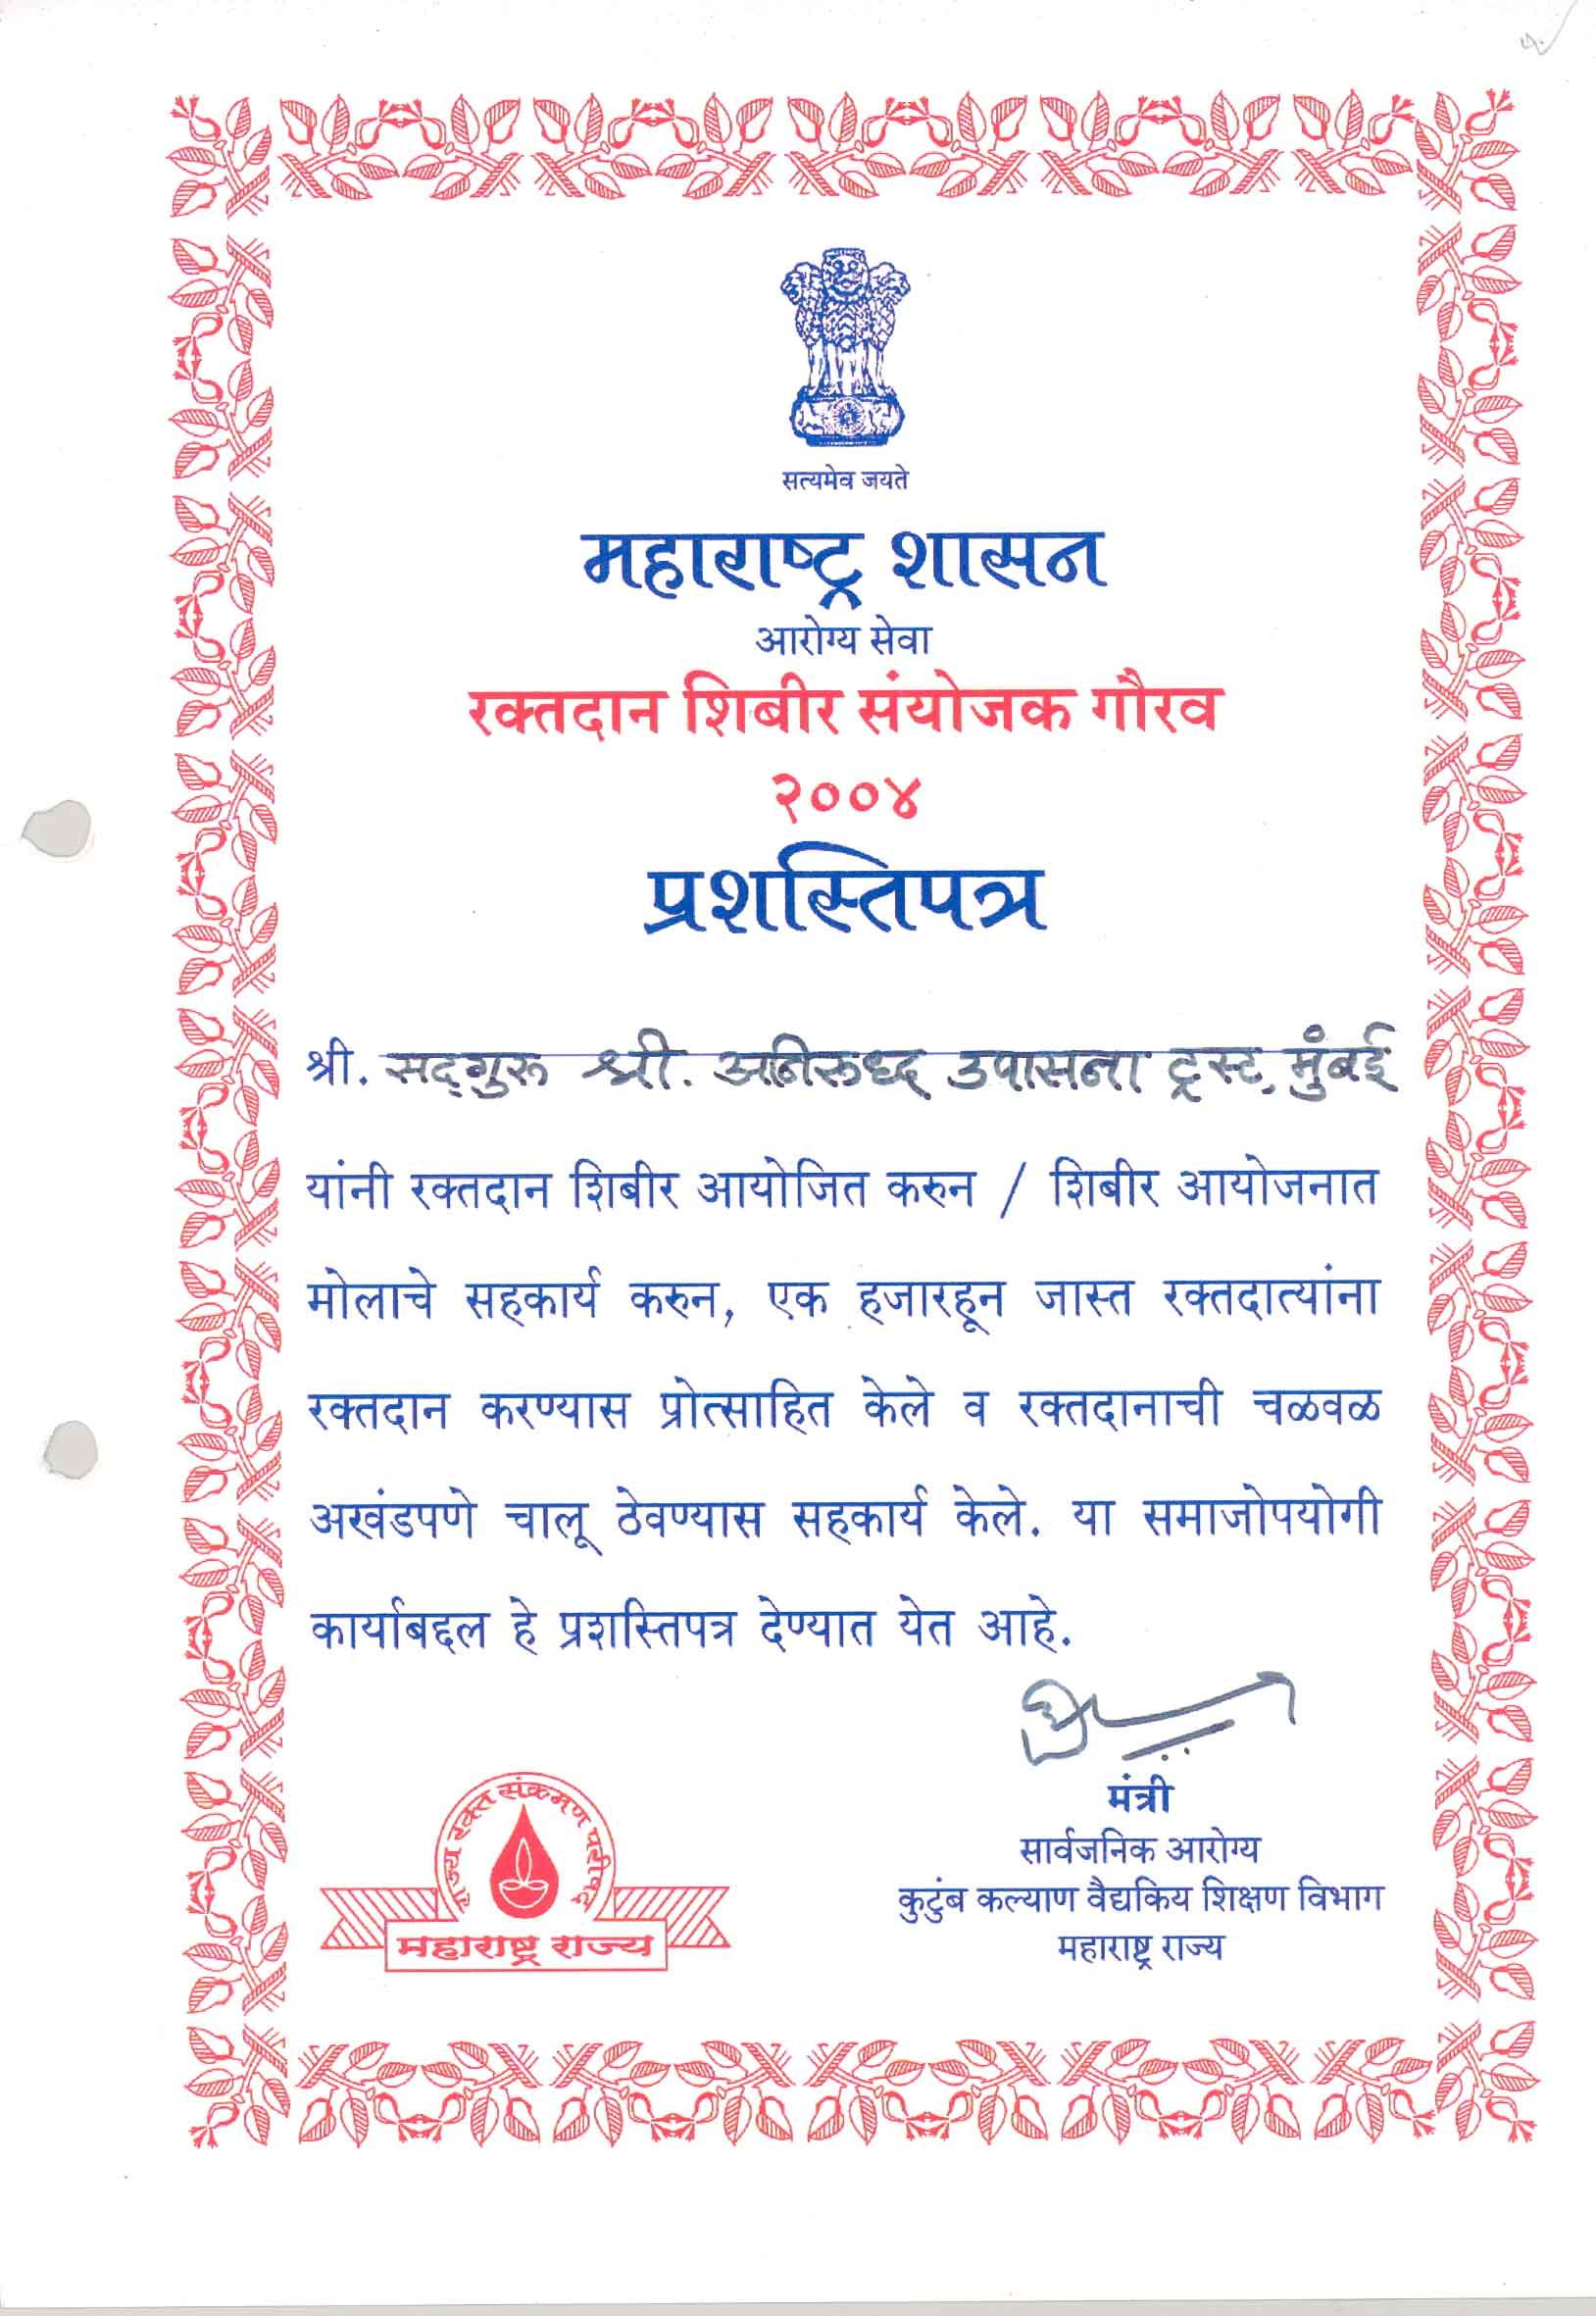 appreciation letter from maharashtra shasan blood bank 2004 for aniruddhafoundation compassion